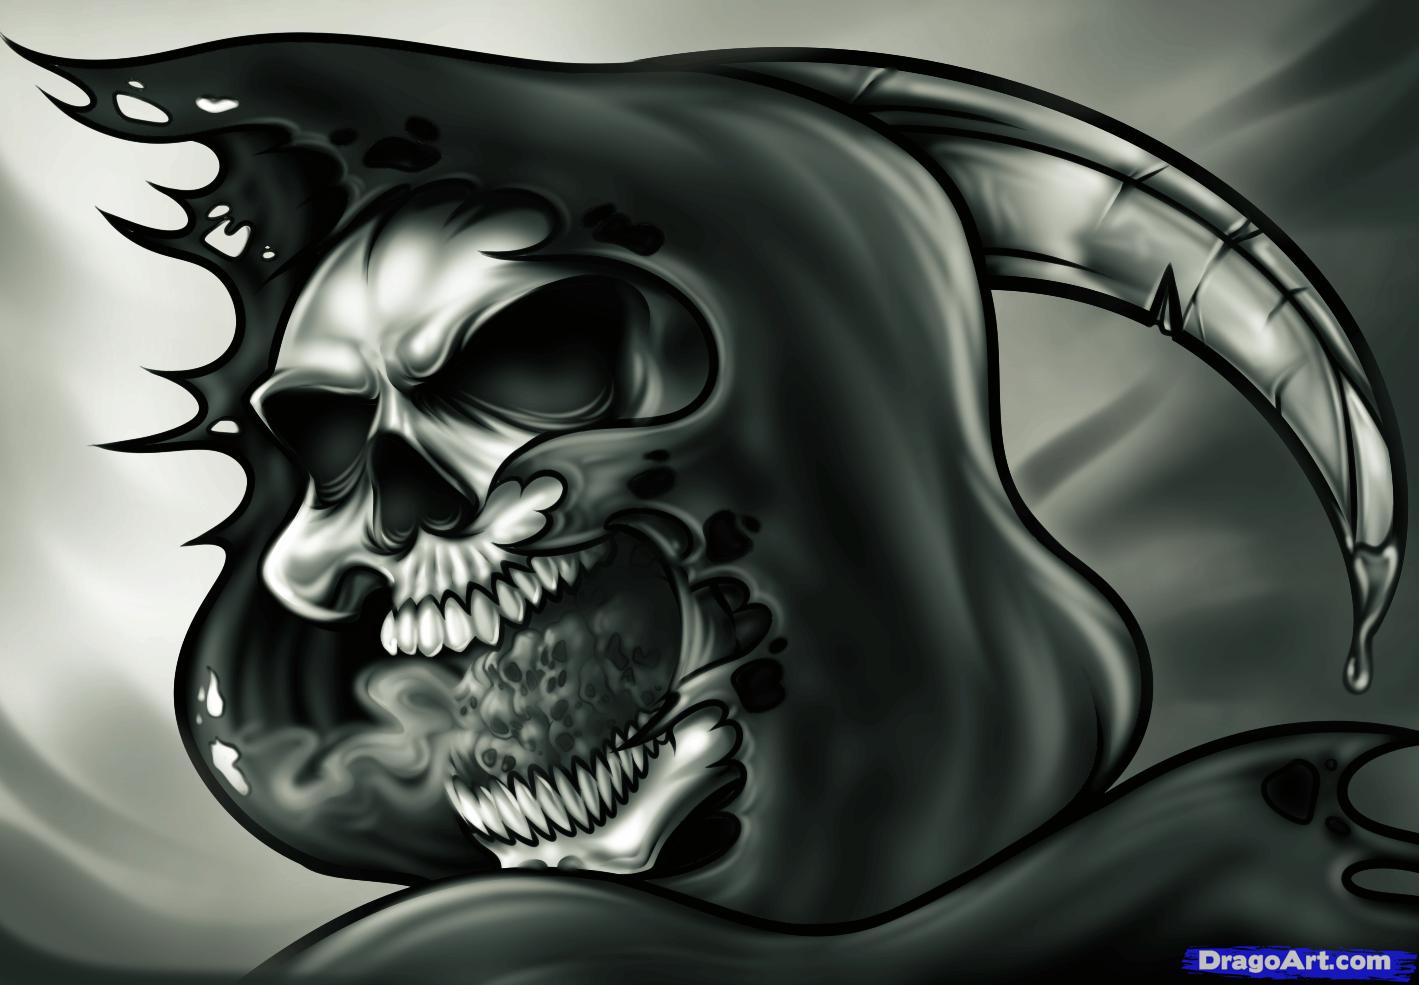 Drawn grim reaper skull Grim a Draw skull reaper